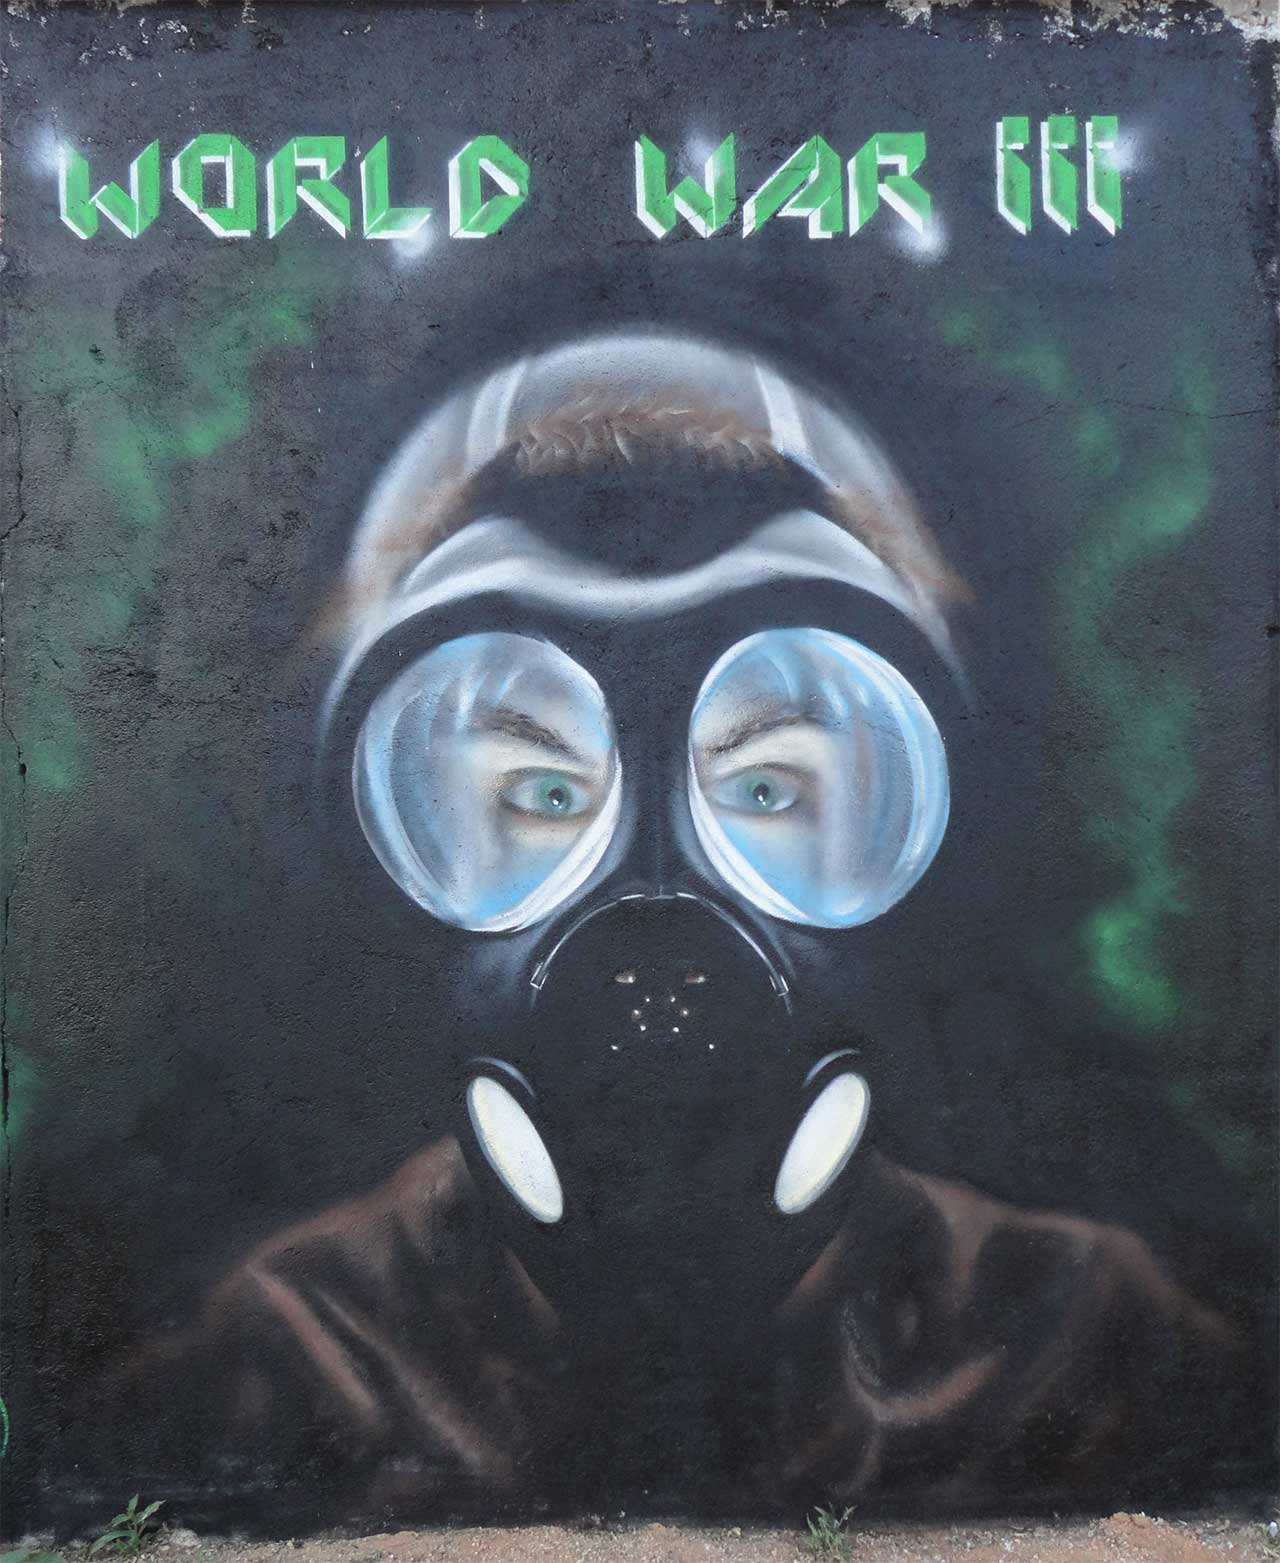 Graffiti guerra nuclear Madrid Zhars